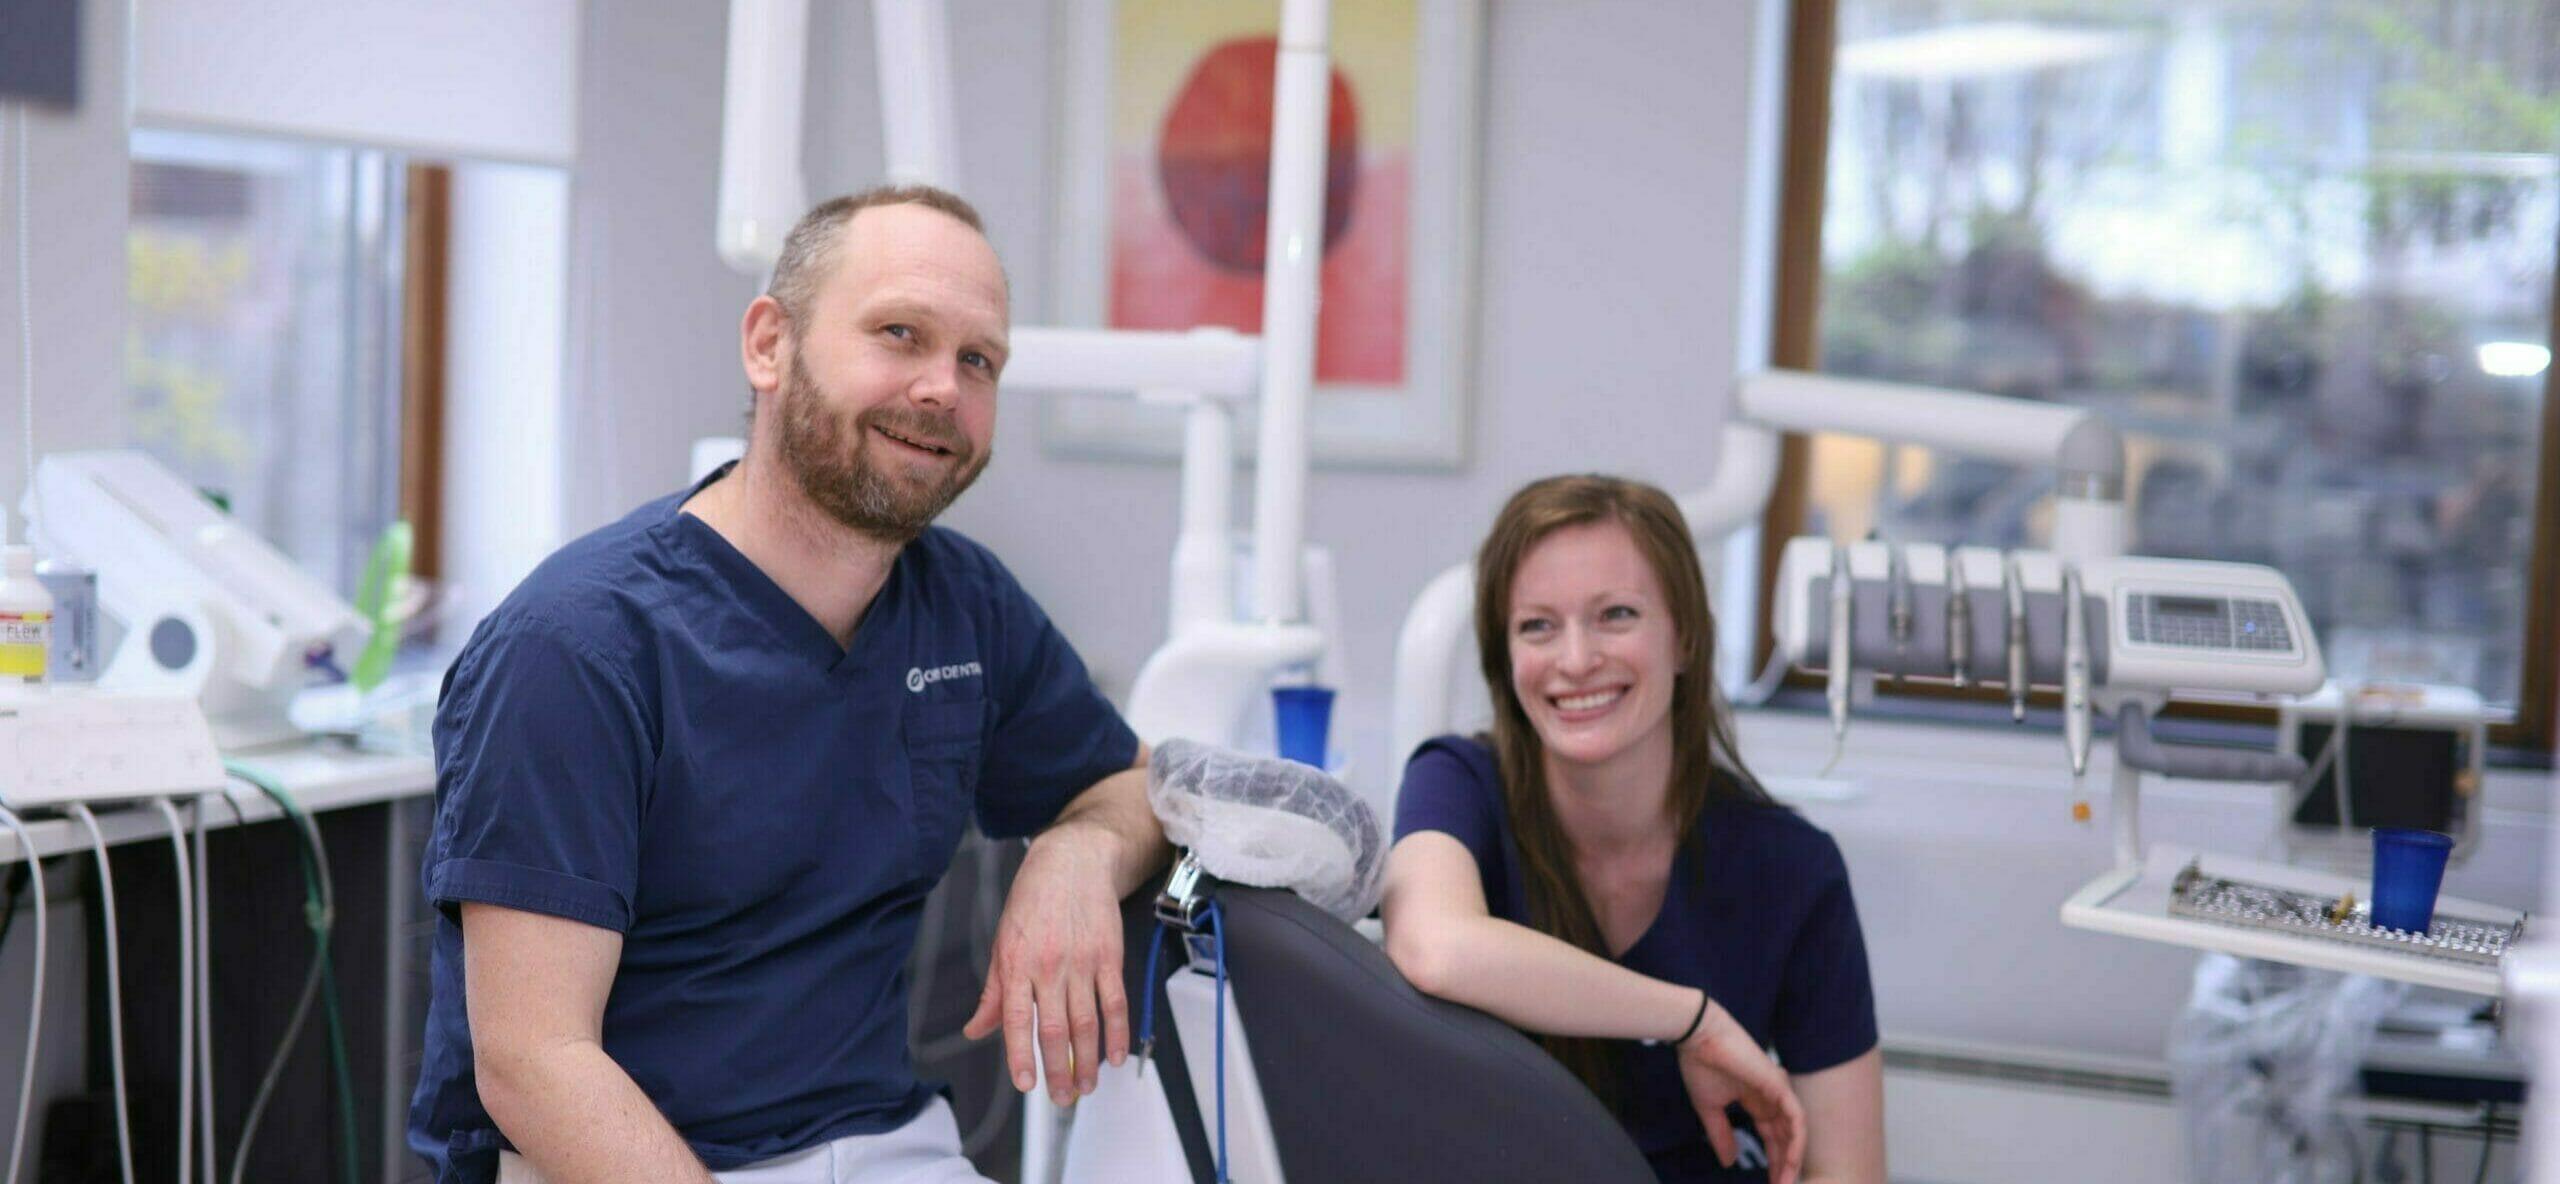 Tannlege Anders Ølund Gerner og tannhelsesekretær på behandlingsrom ved Oris Dental Homansbyen ved Bogstadveien i Oslo.